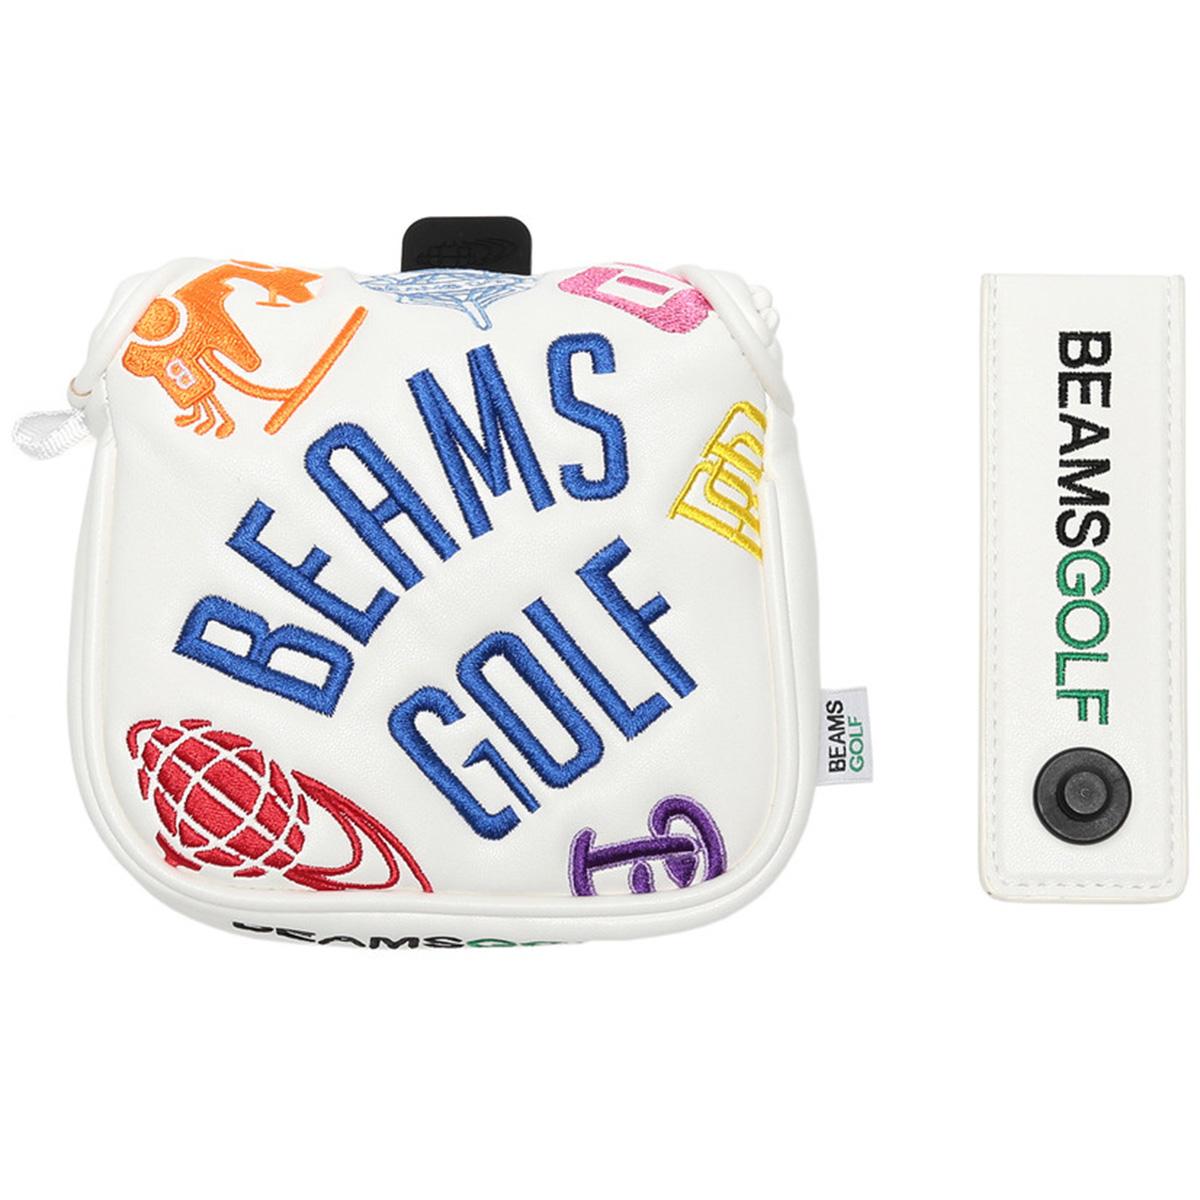 BEAMS GOLF various ロゴ パターカバー